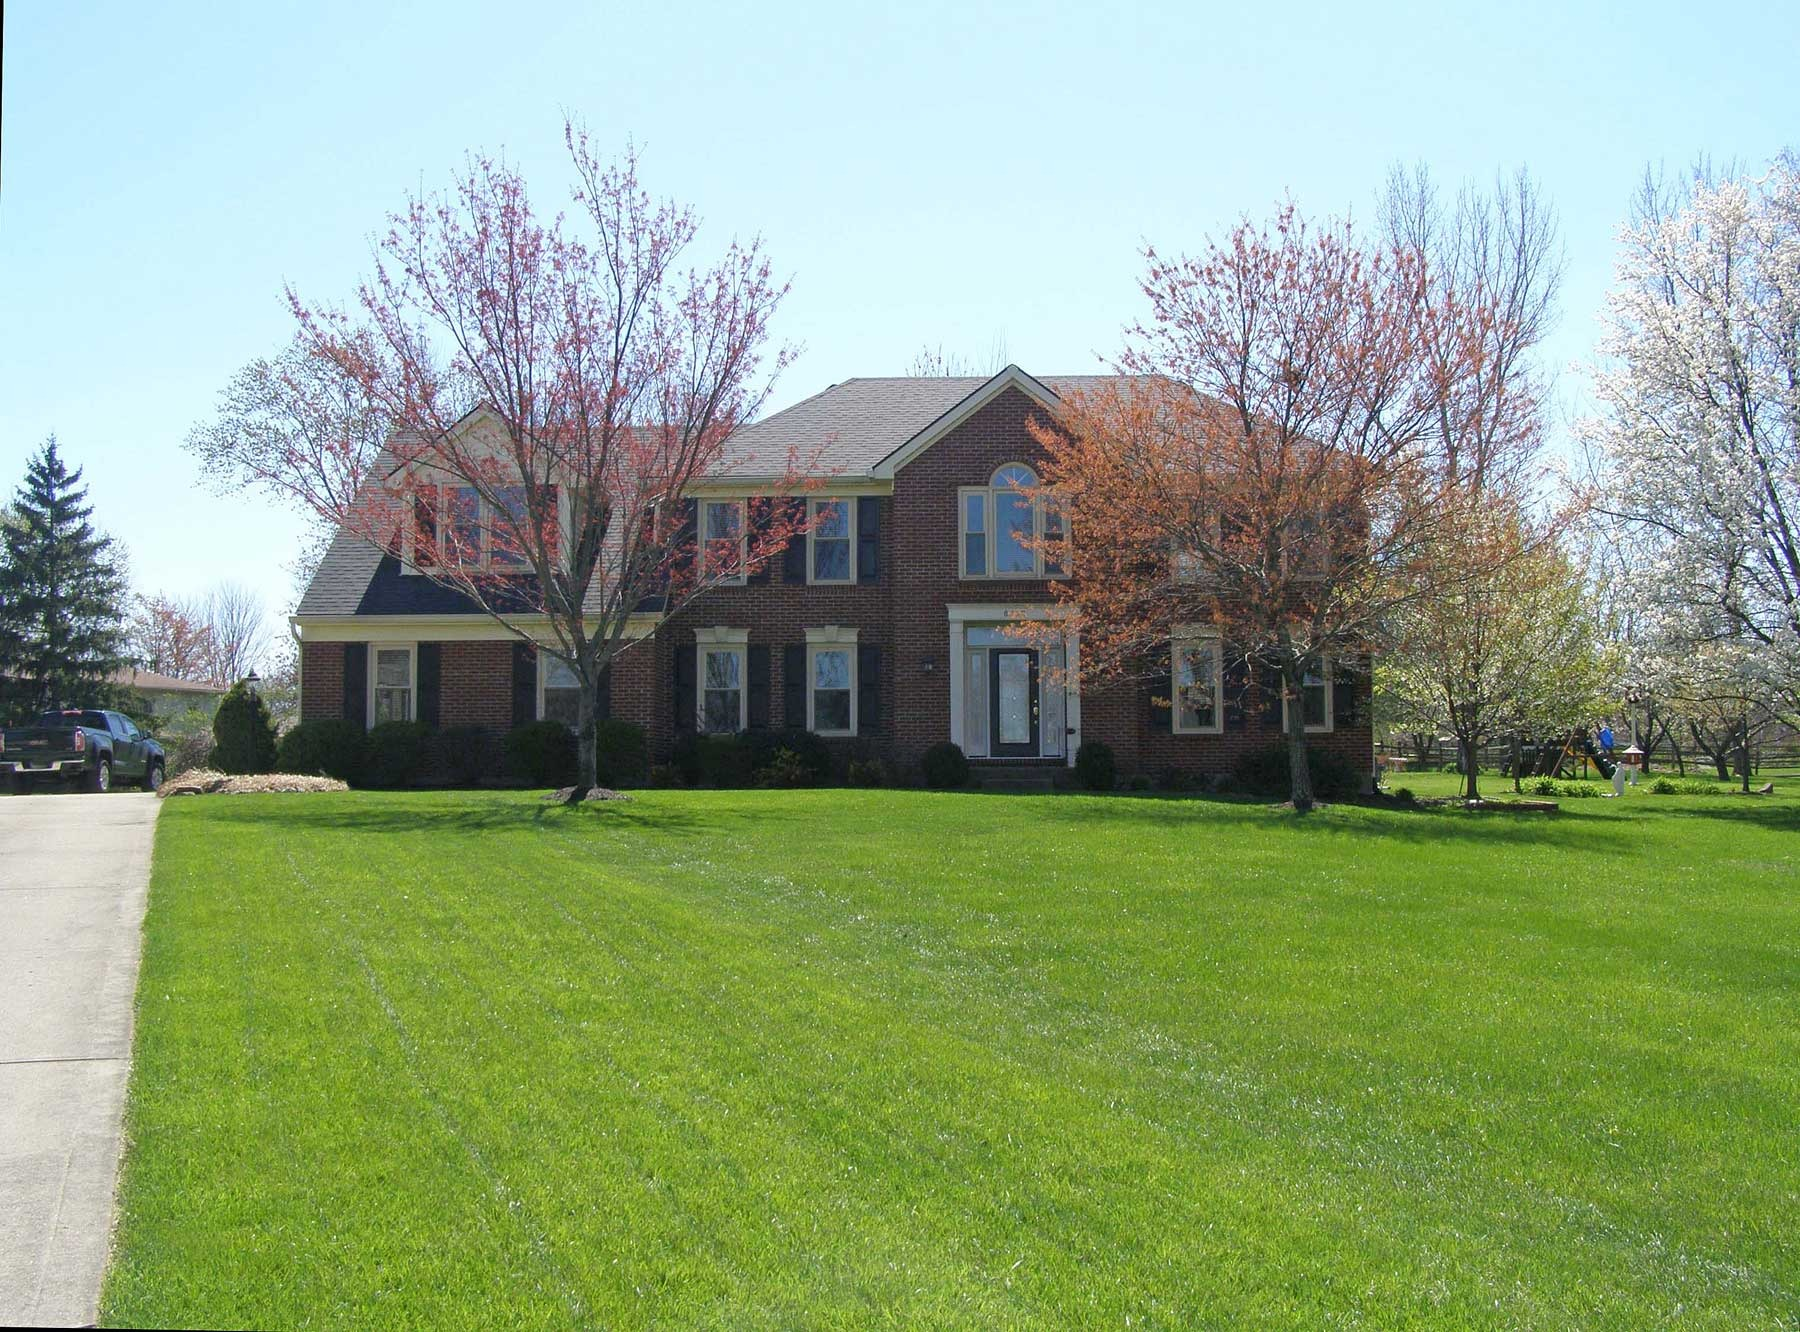 west chester ohio home for sale. Black Bedroom Furniture Sets. Home Design Ideas